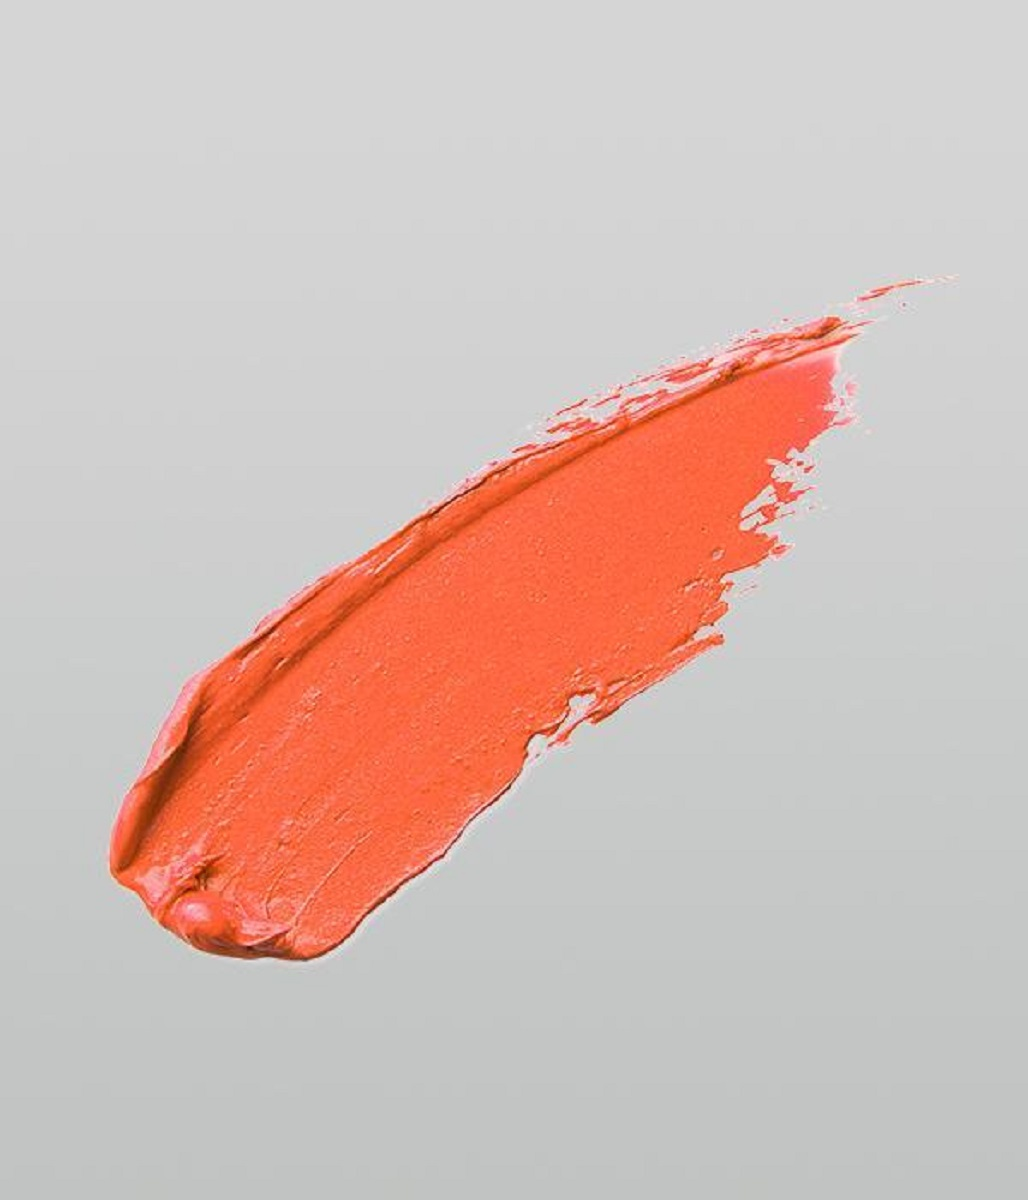 Antipodes Lipstick Piha Beach Tangerine 4g_media-04